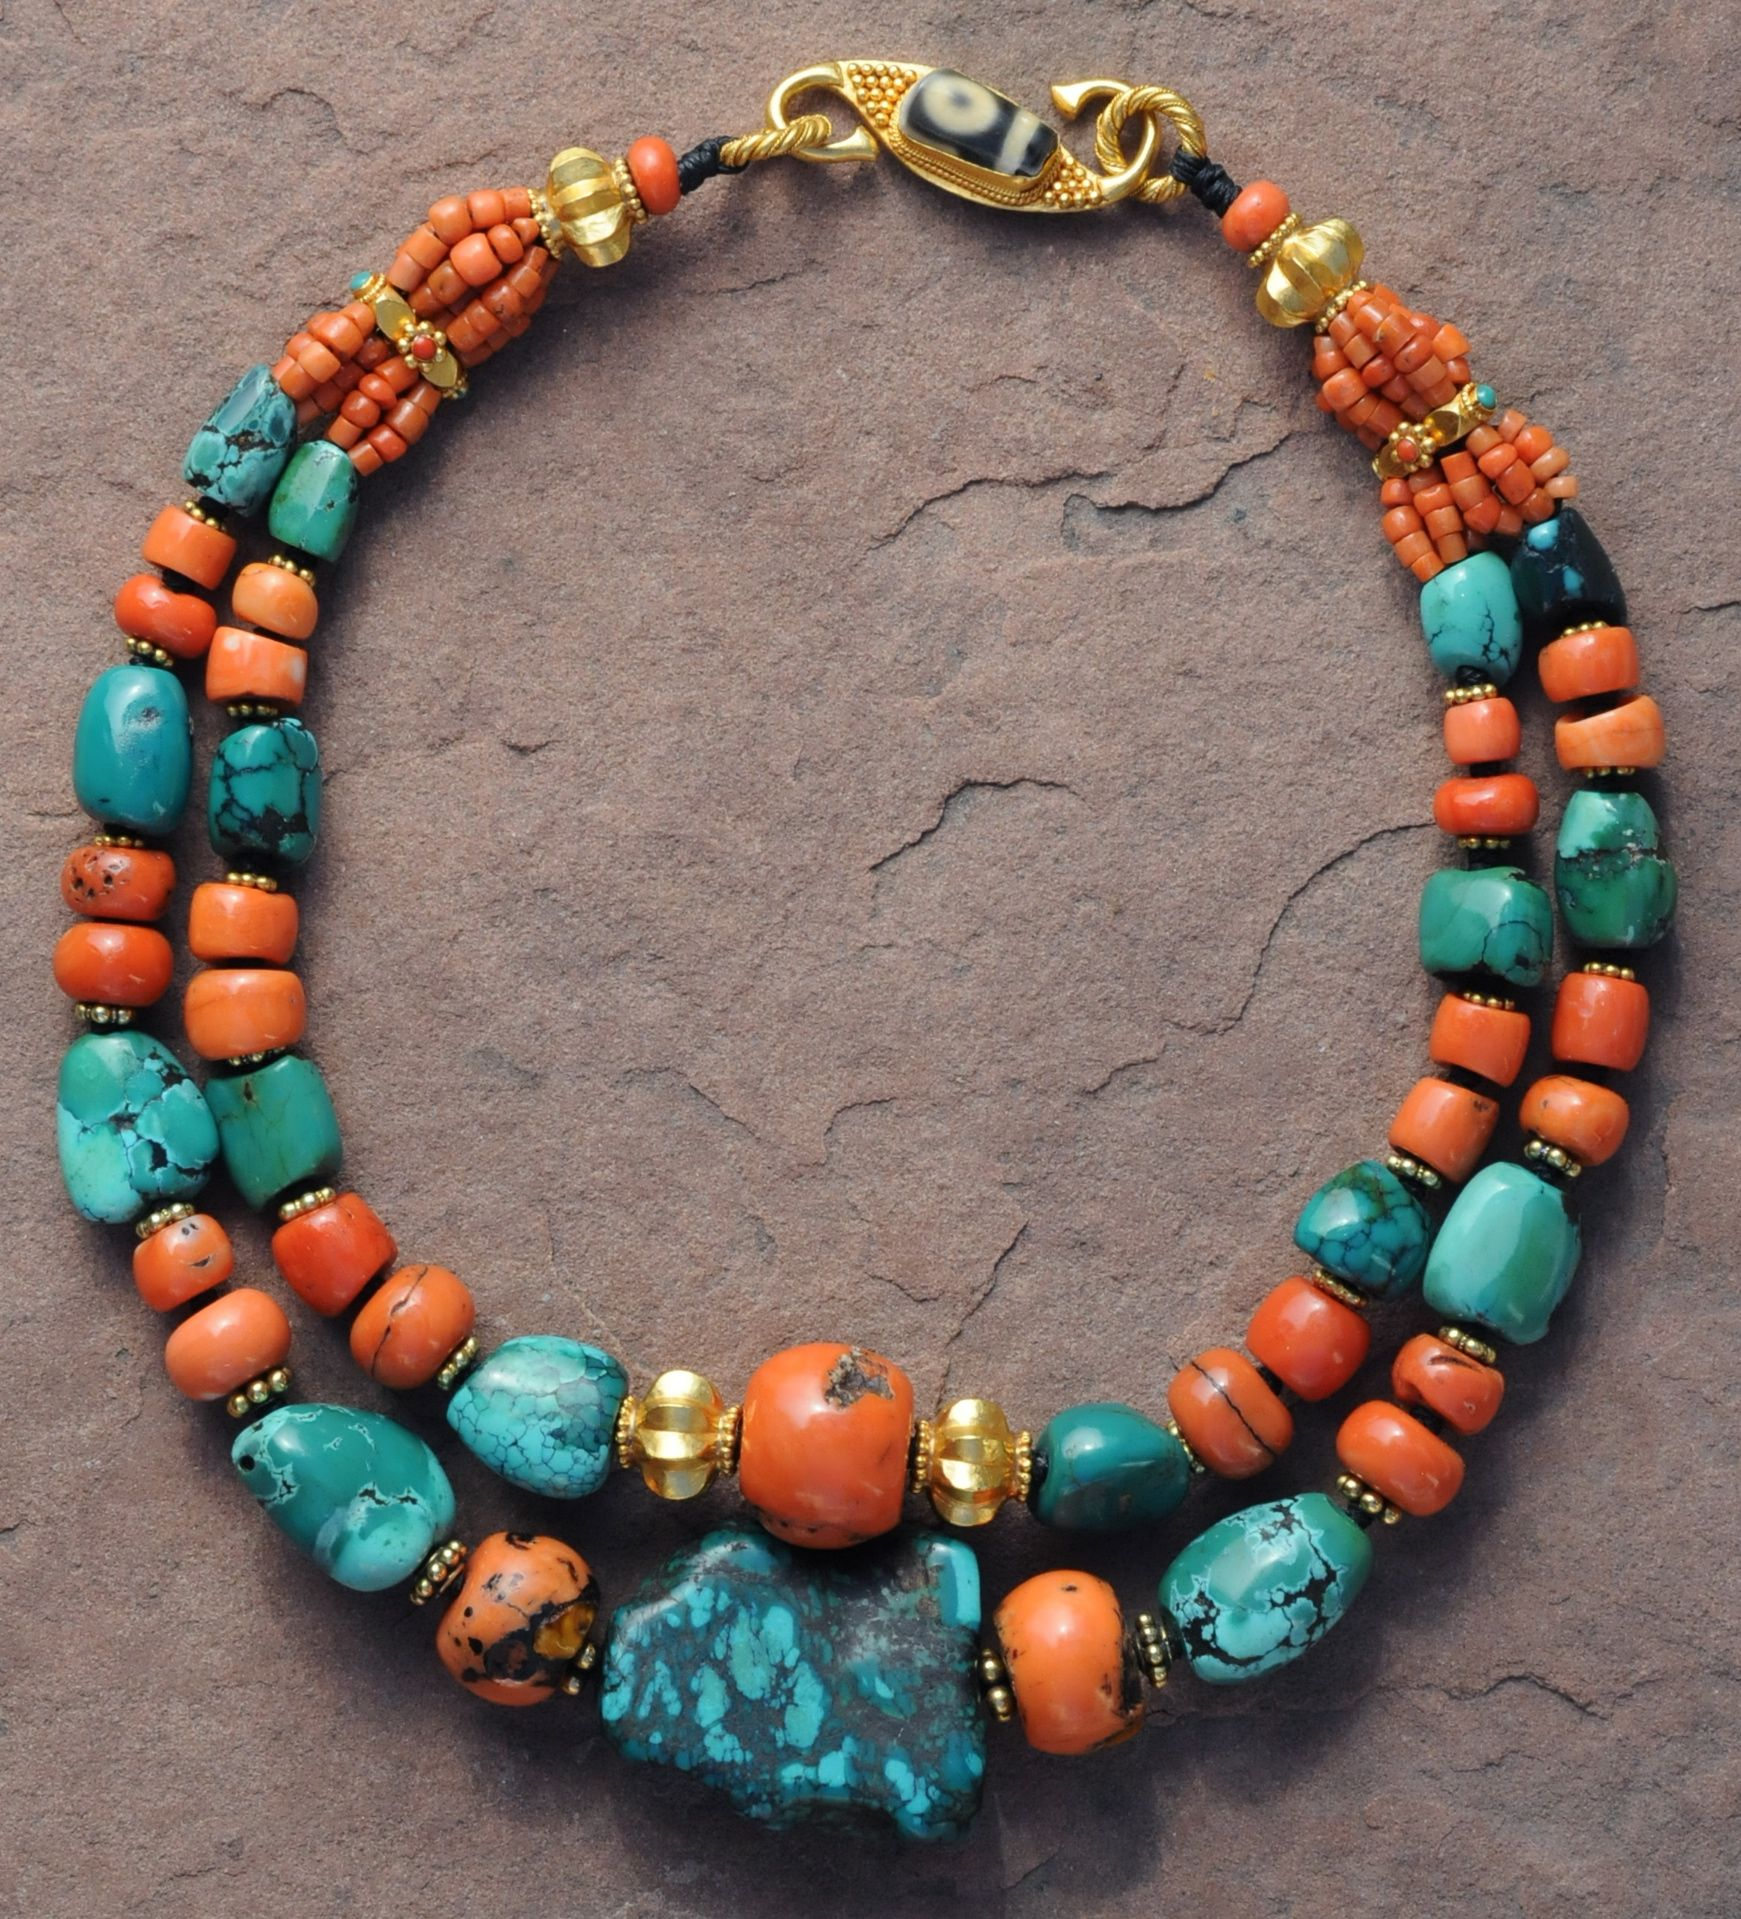 Original Beads: Nomad Bead Merchants Collection~ Tibetan Obsession